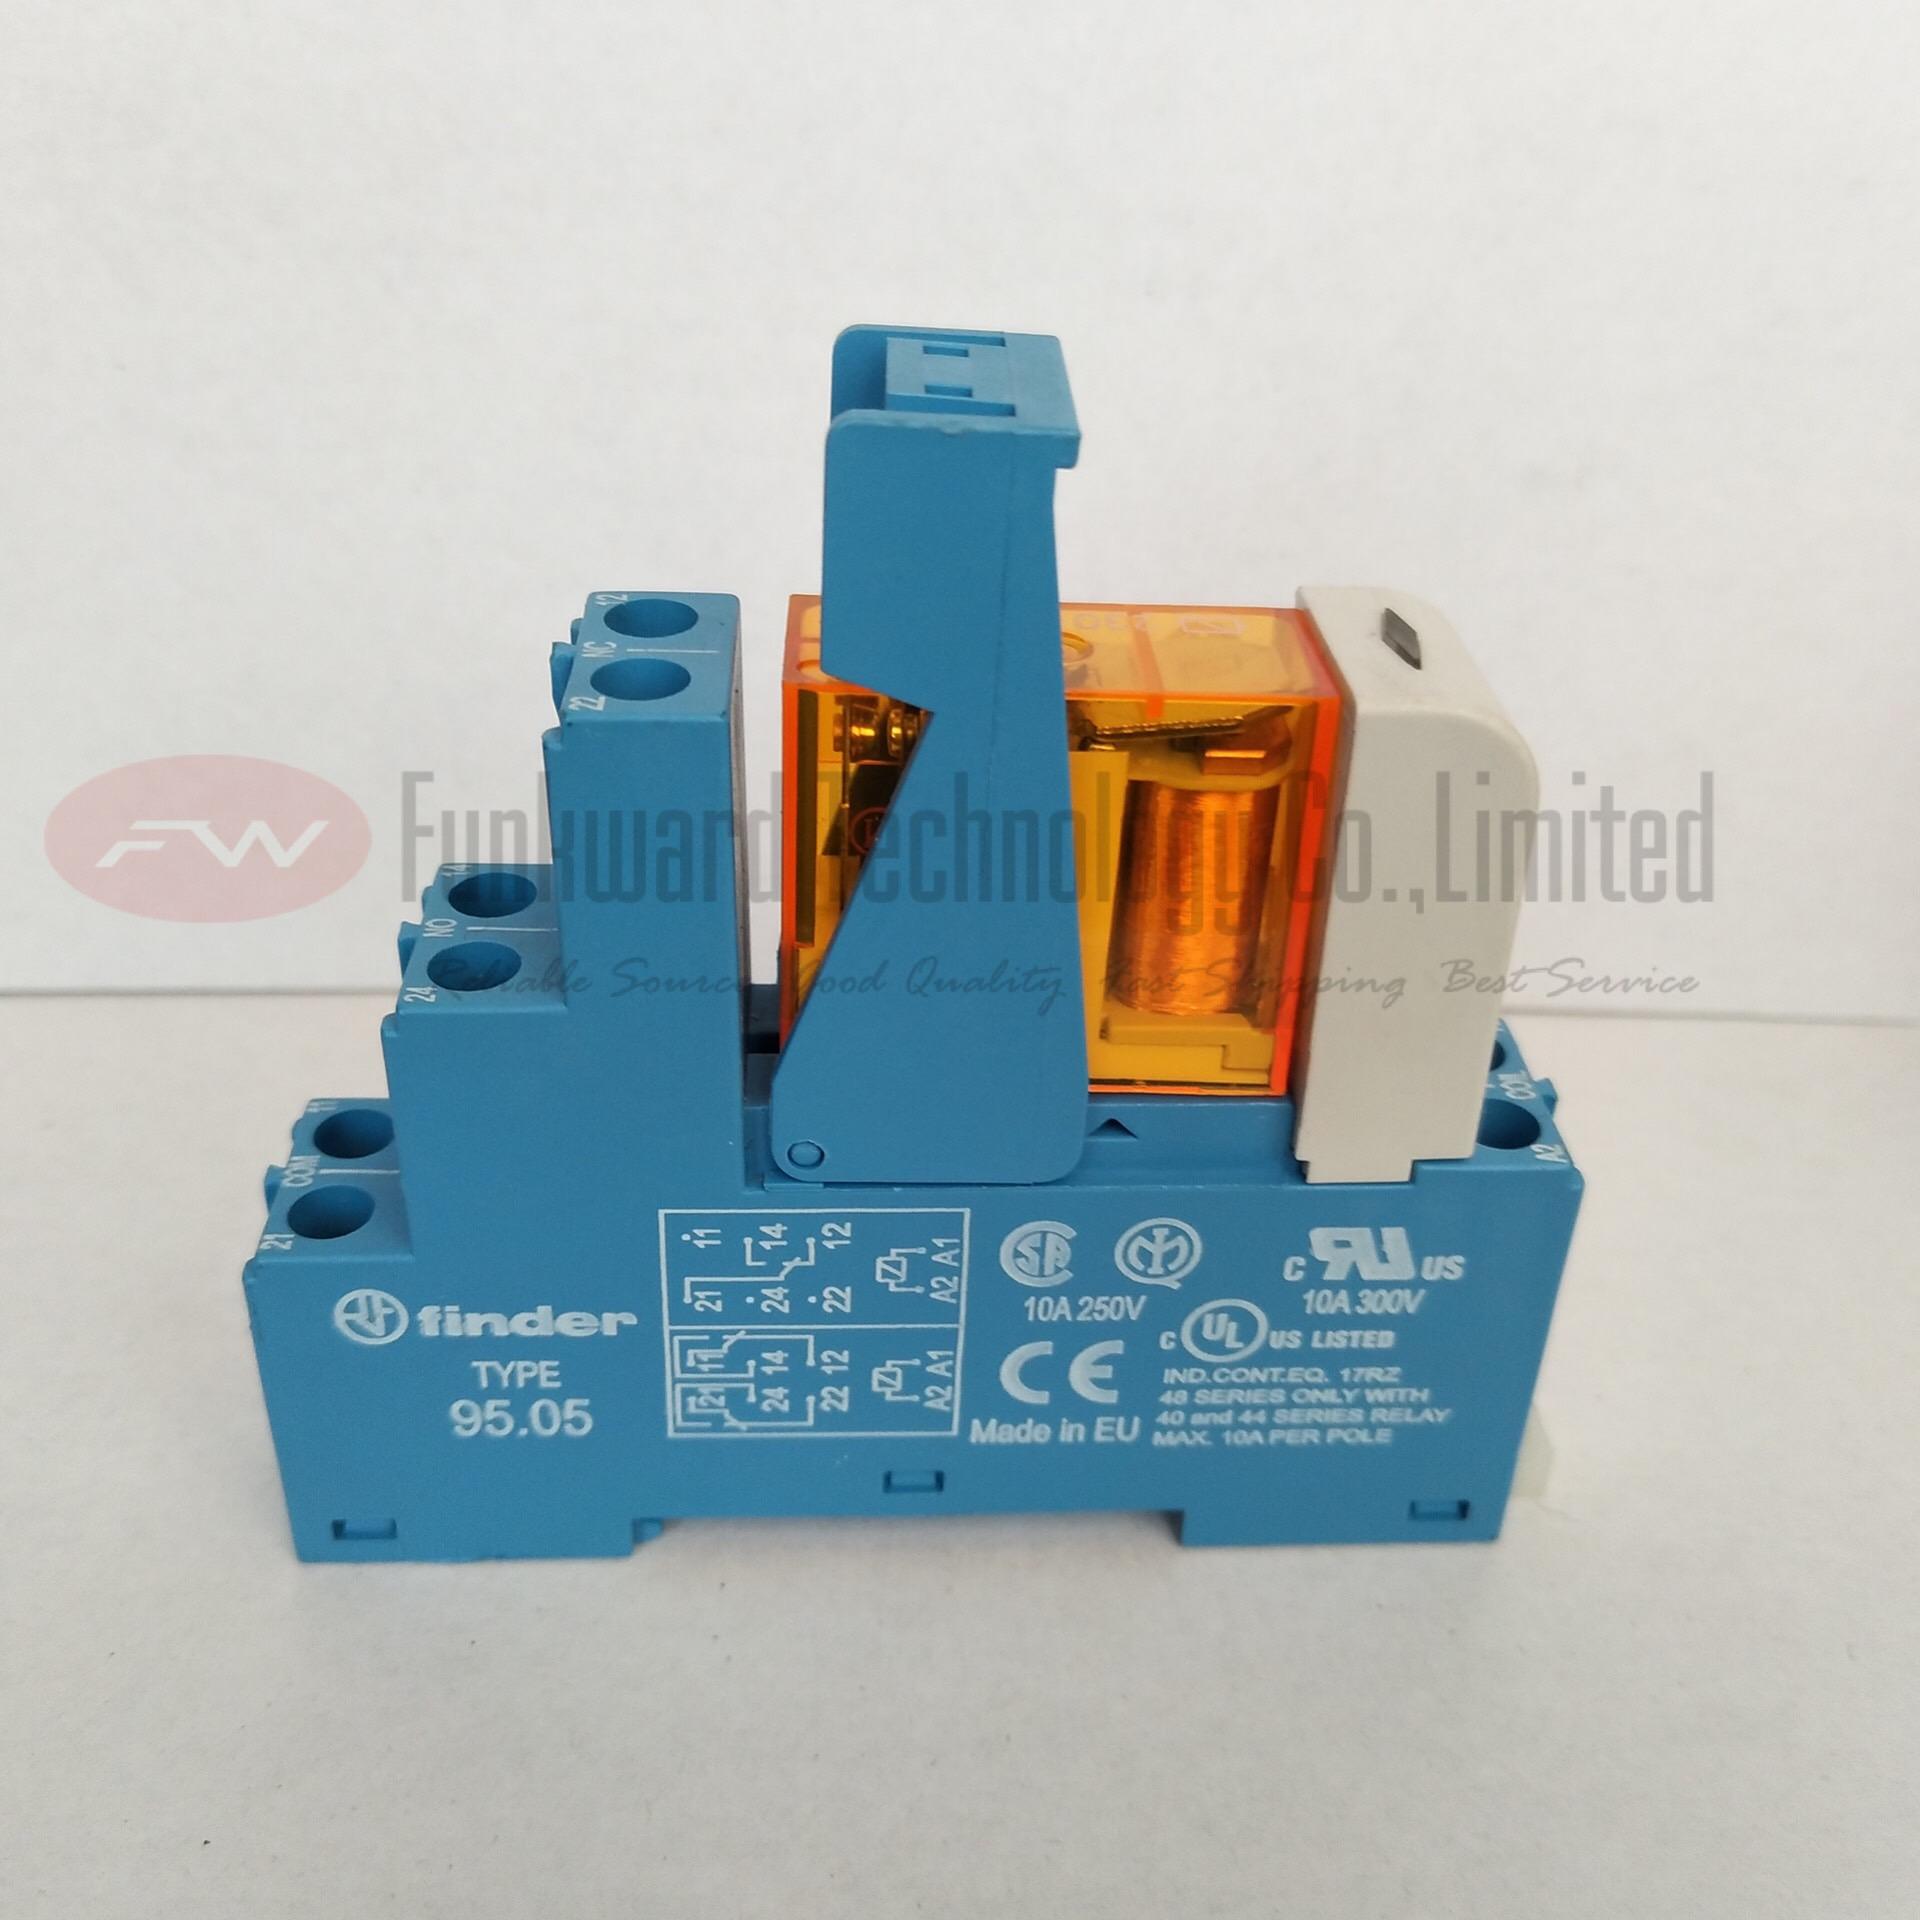 FINDER  40.52S  95.05  GENERAL PURPOSE RELAY W//SOCKET 24 VDC